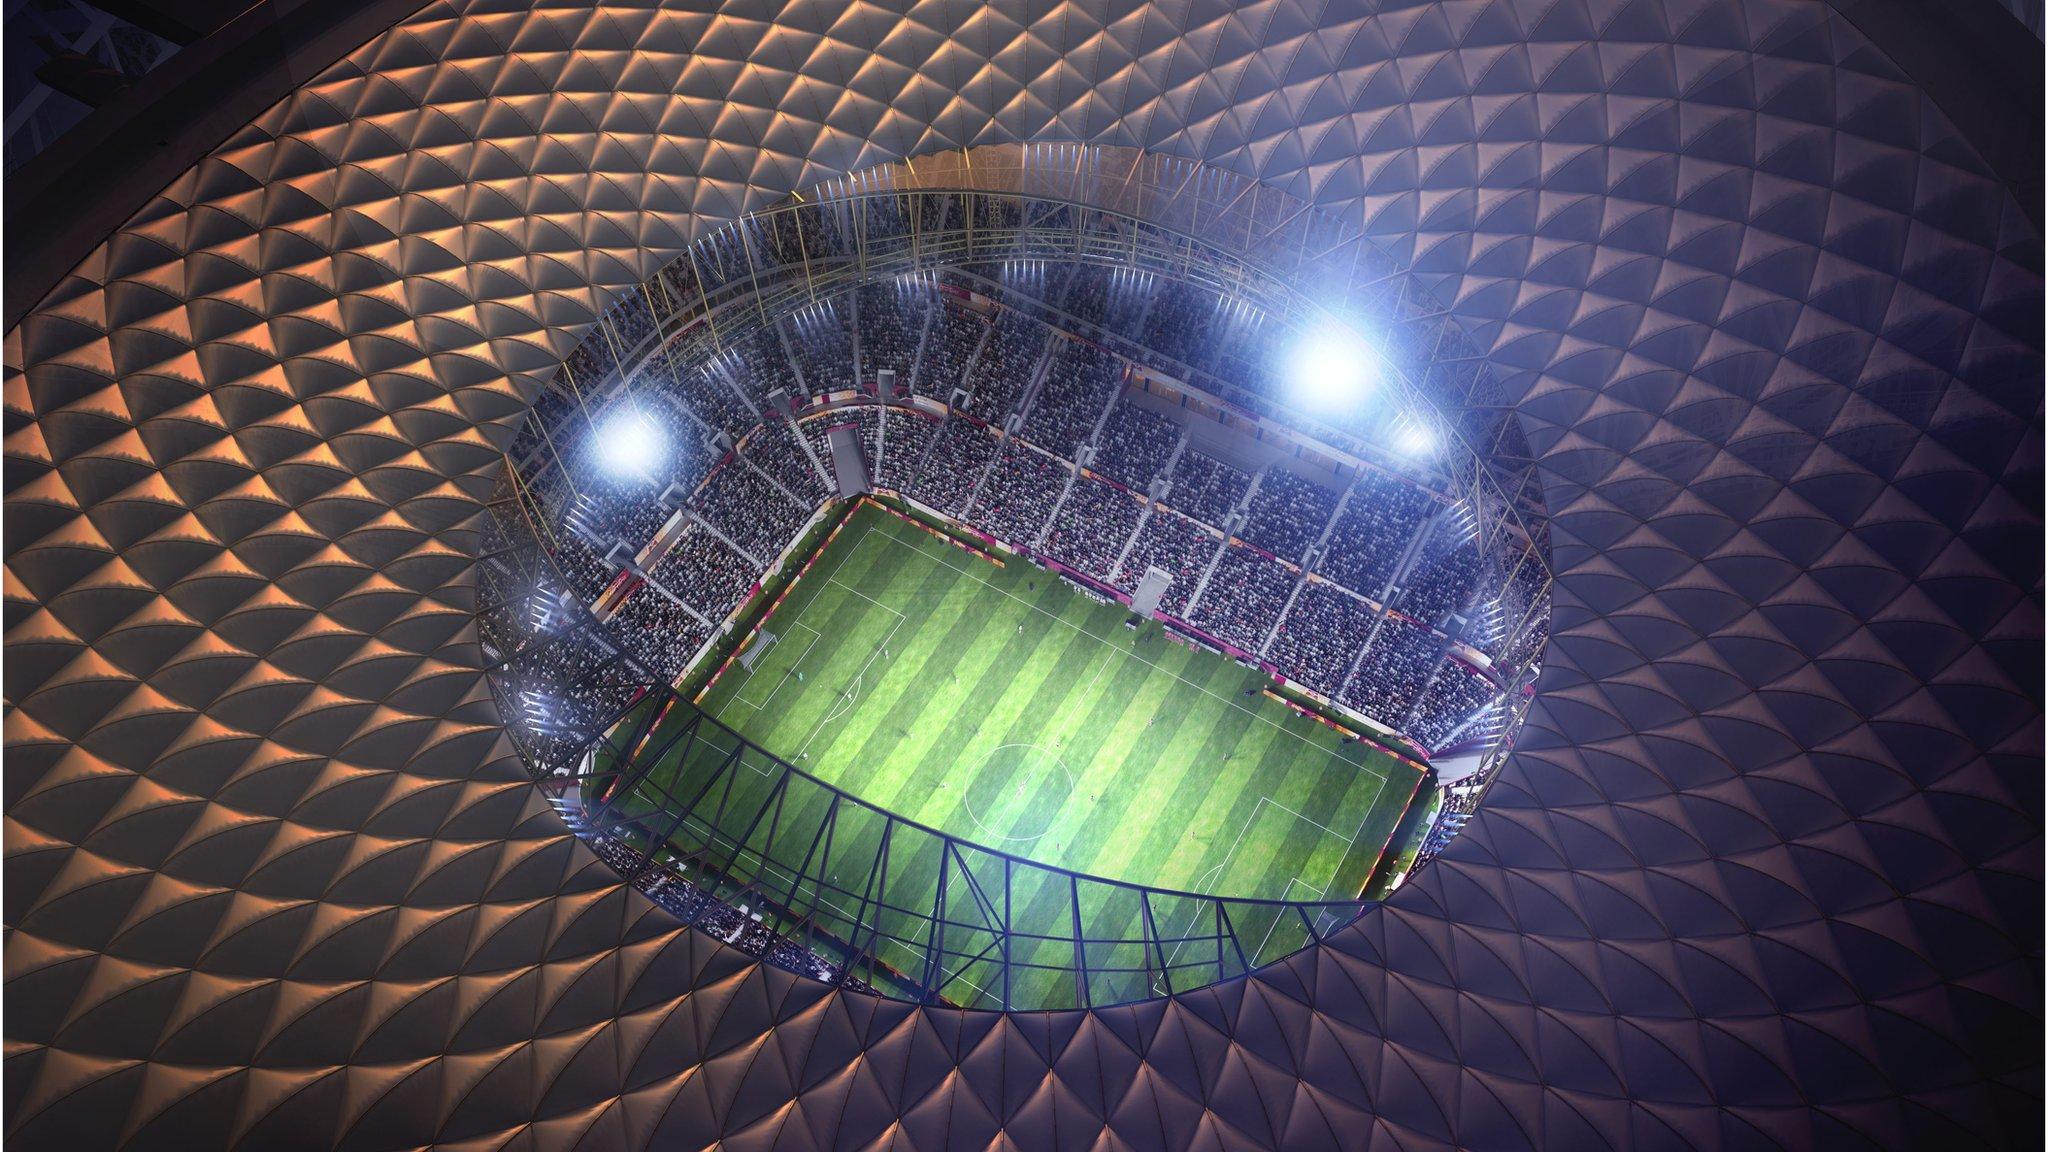 Qatar 2022 World Cup: Tournament organisers unveil designs for Lusail Stadium